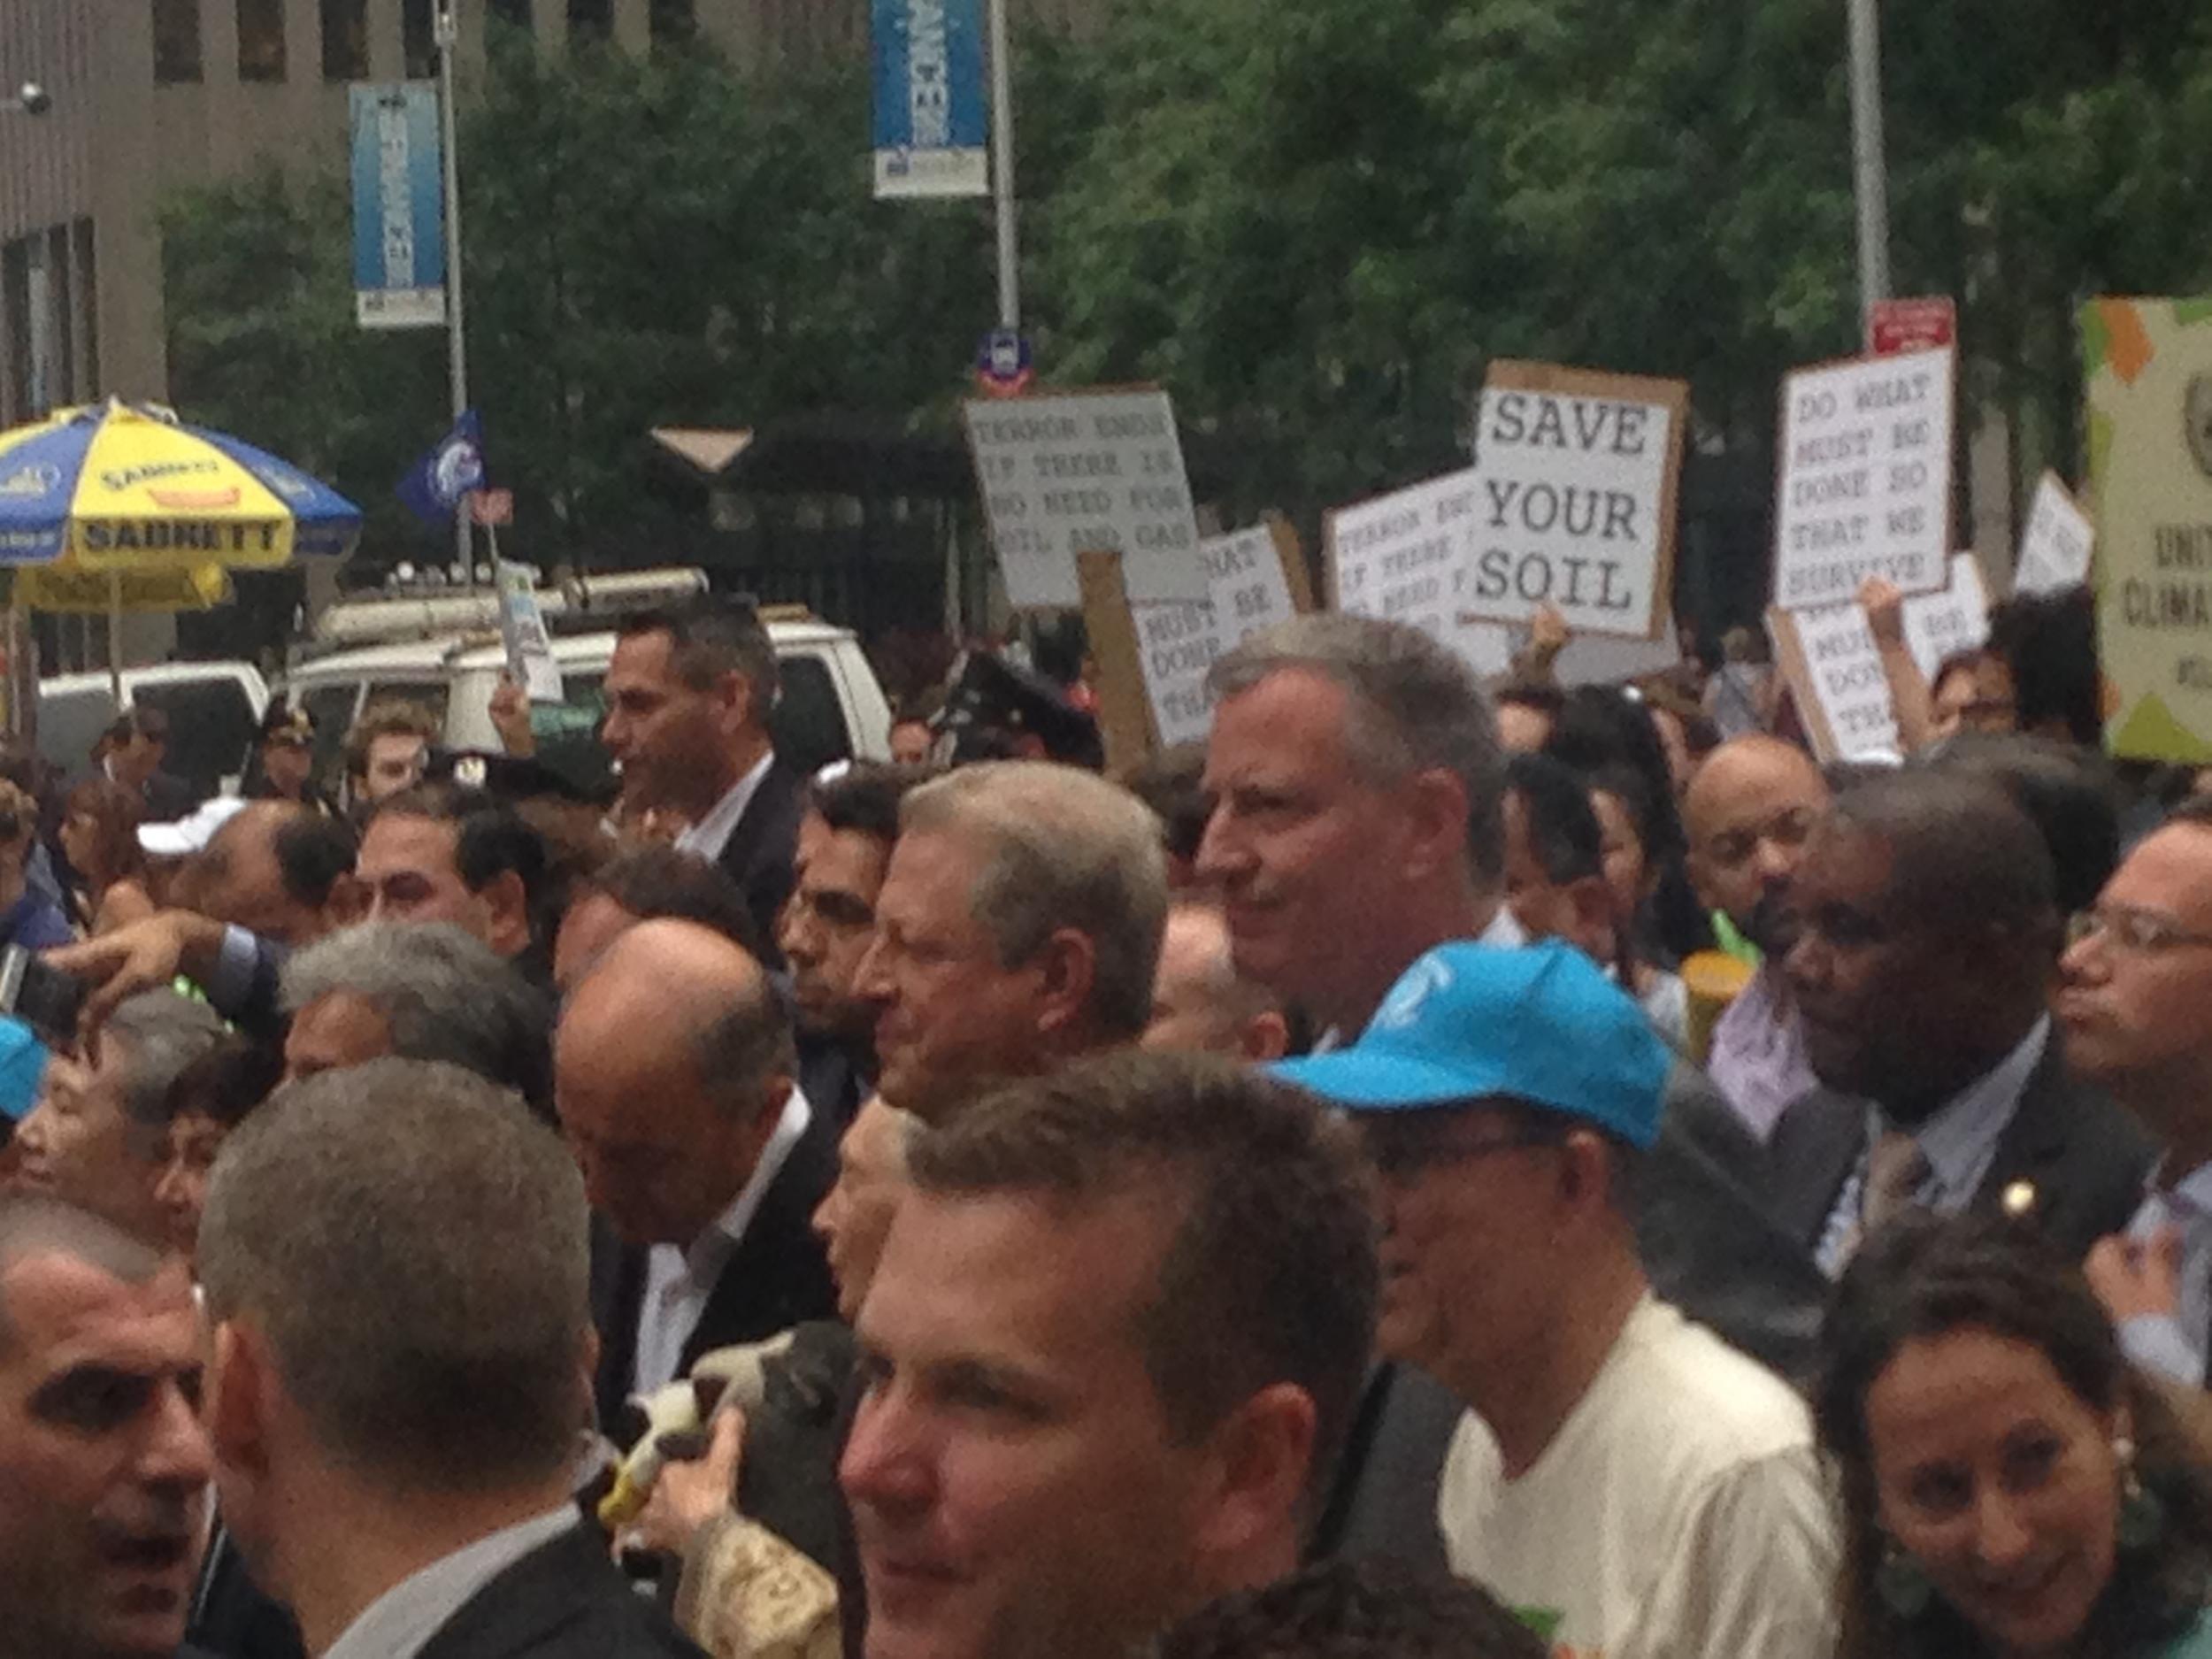 Ban Ki-moon, Jane Goodall, Al Gore & Bill de Balsio in the crowd.